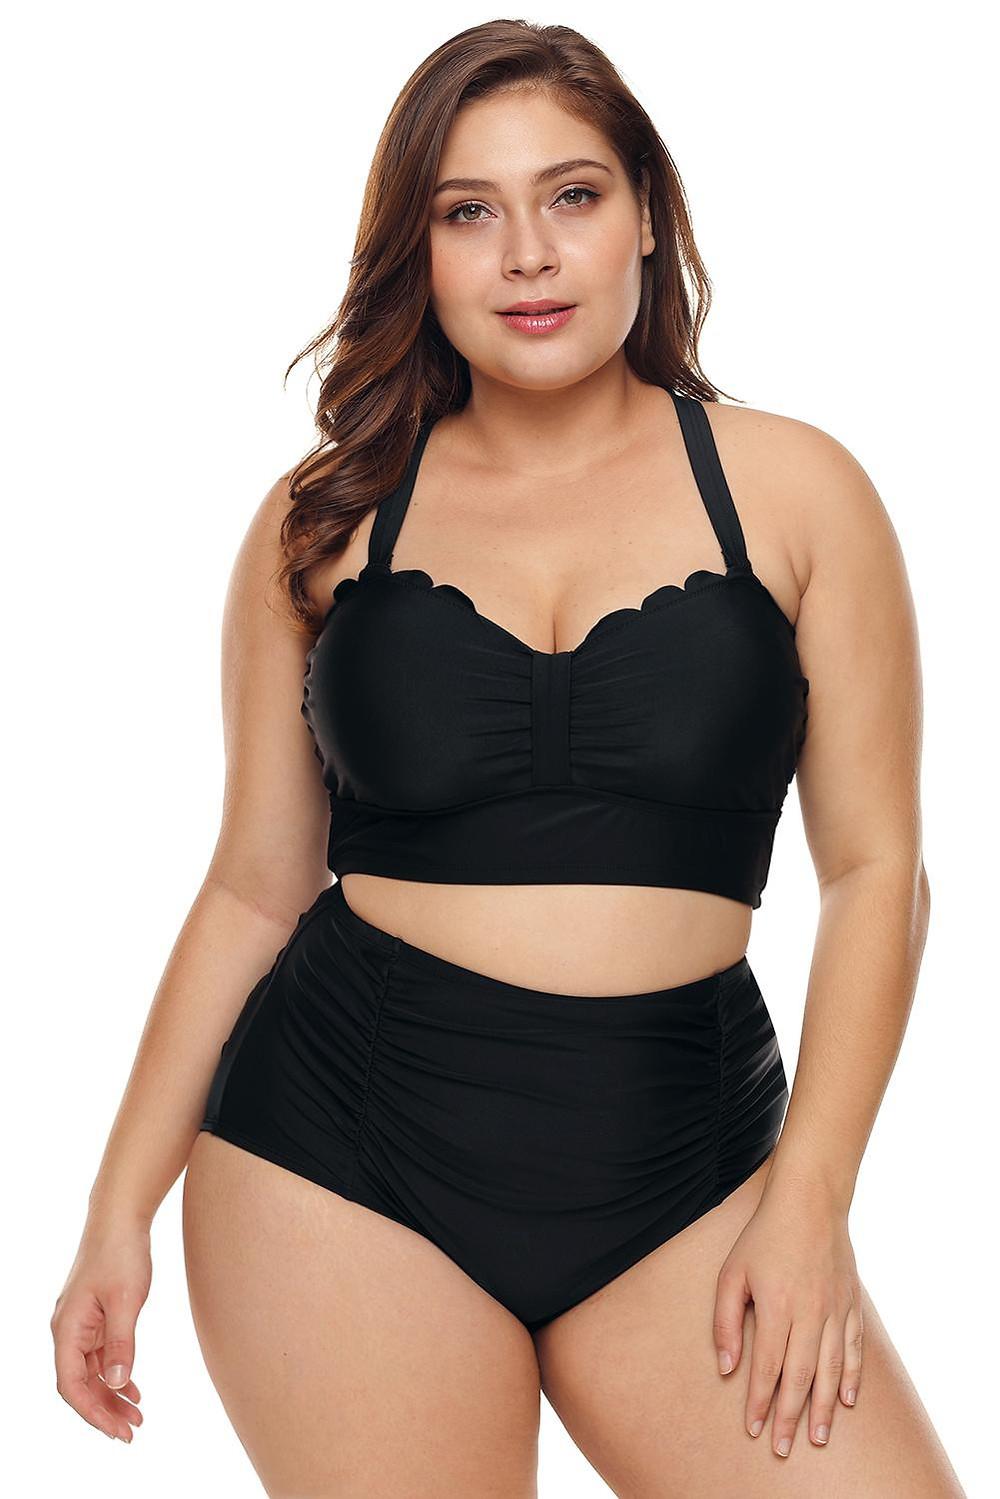 Plus size swimwear lingerie australia